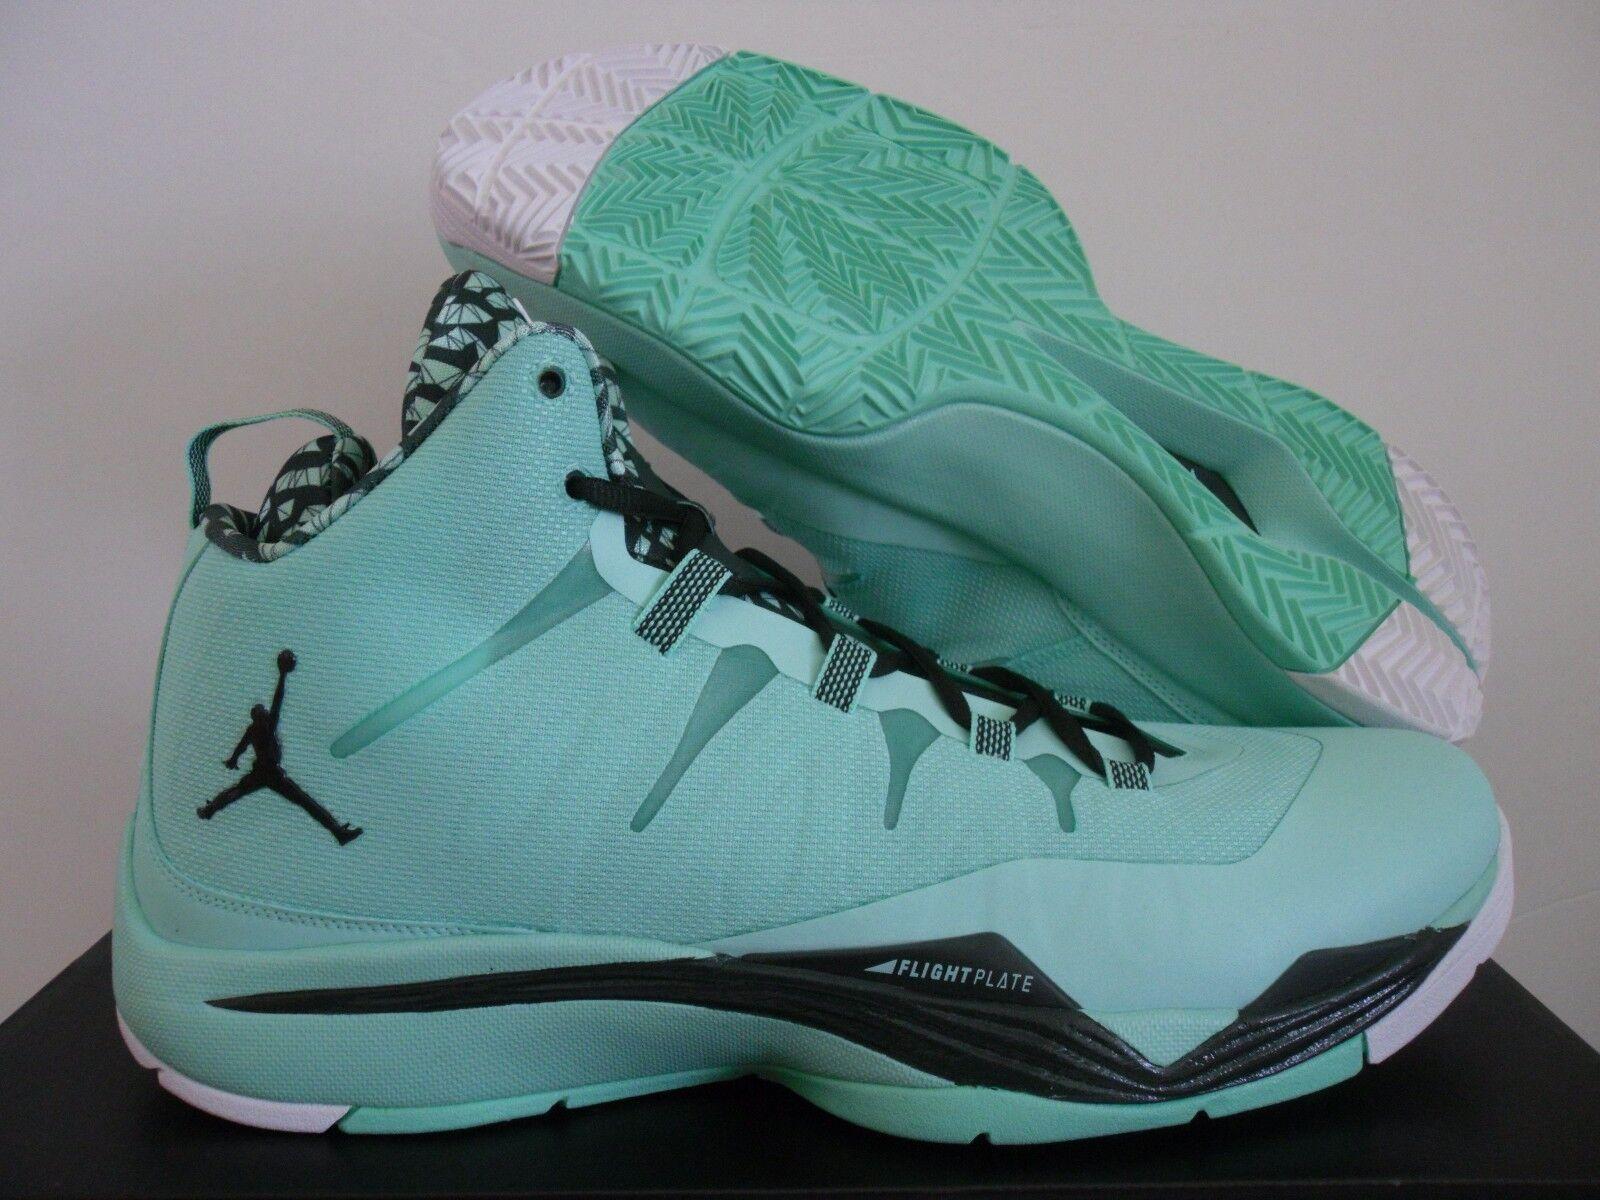 Nike air jordan 2 green glow-nero-white sz 14 [599945-330]